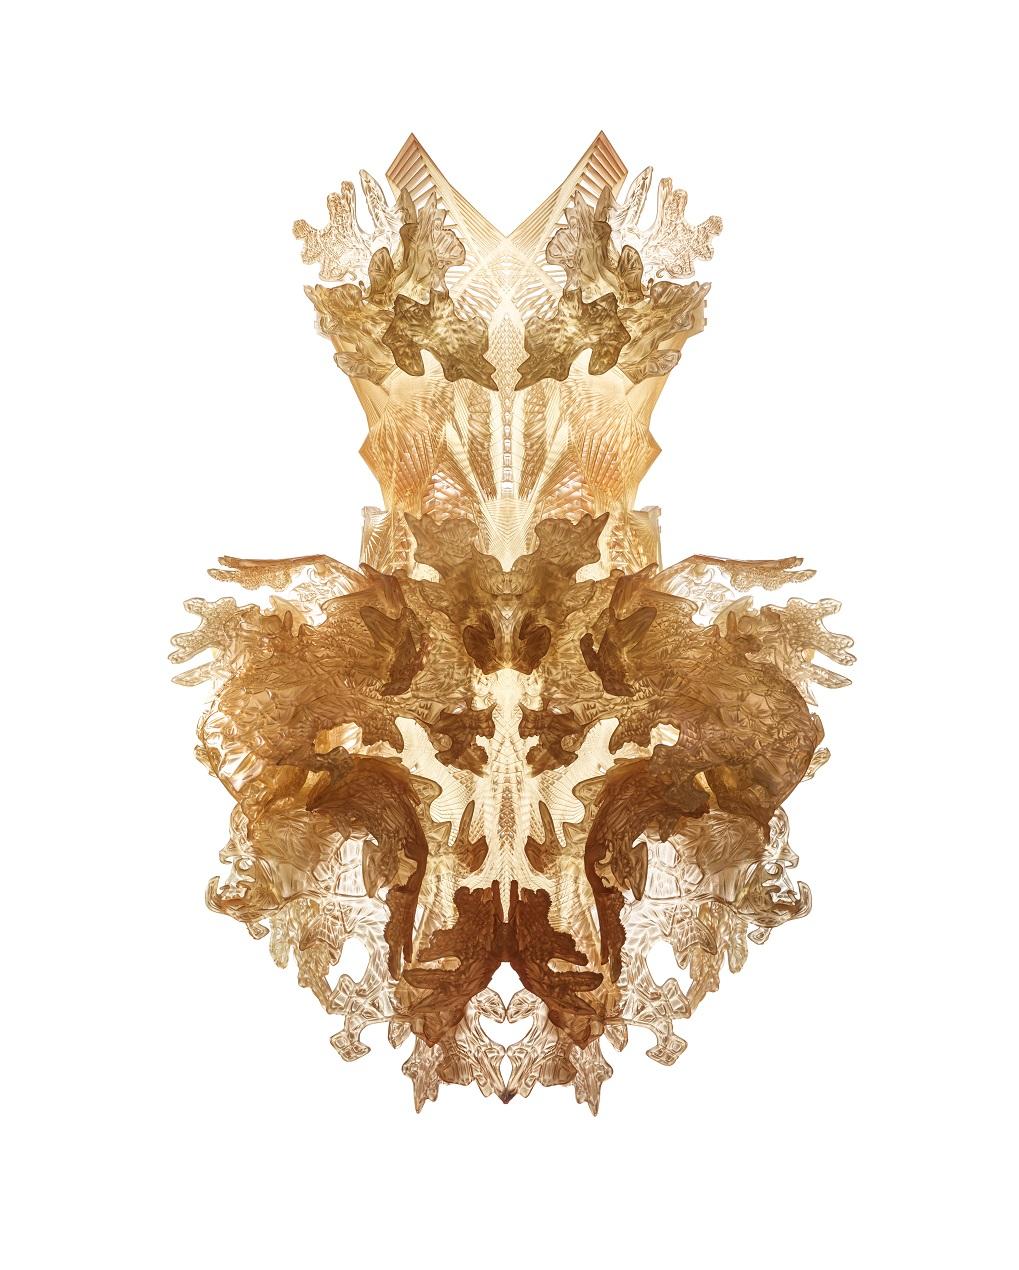 Iris van Herpen (Dutch, born 1984), Hybrid Holism, Dress, July 2012. 3D-printed UV-curable polymer. Supported by the Friends of Iris van Herpen, 2015.170. Photo by Bart Oomes, No 6 Studios. © Iris van Herpen.